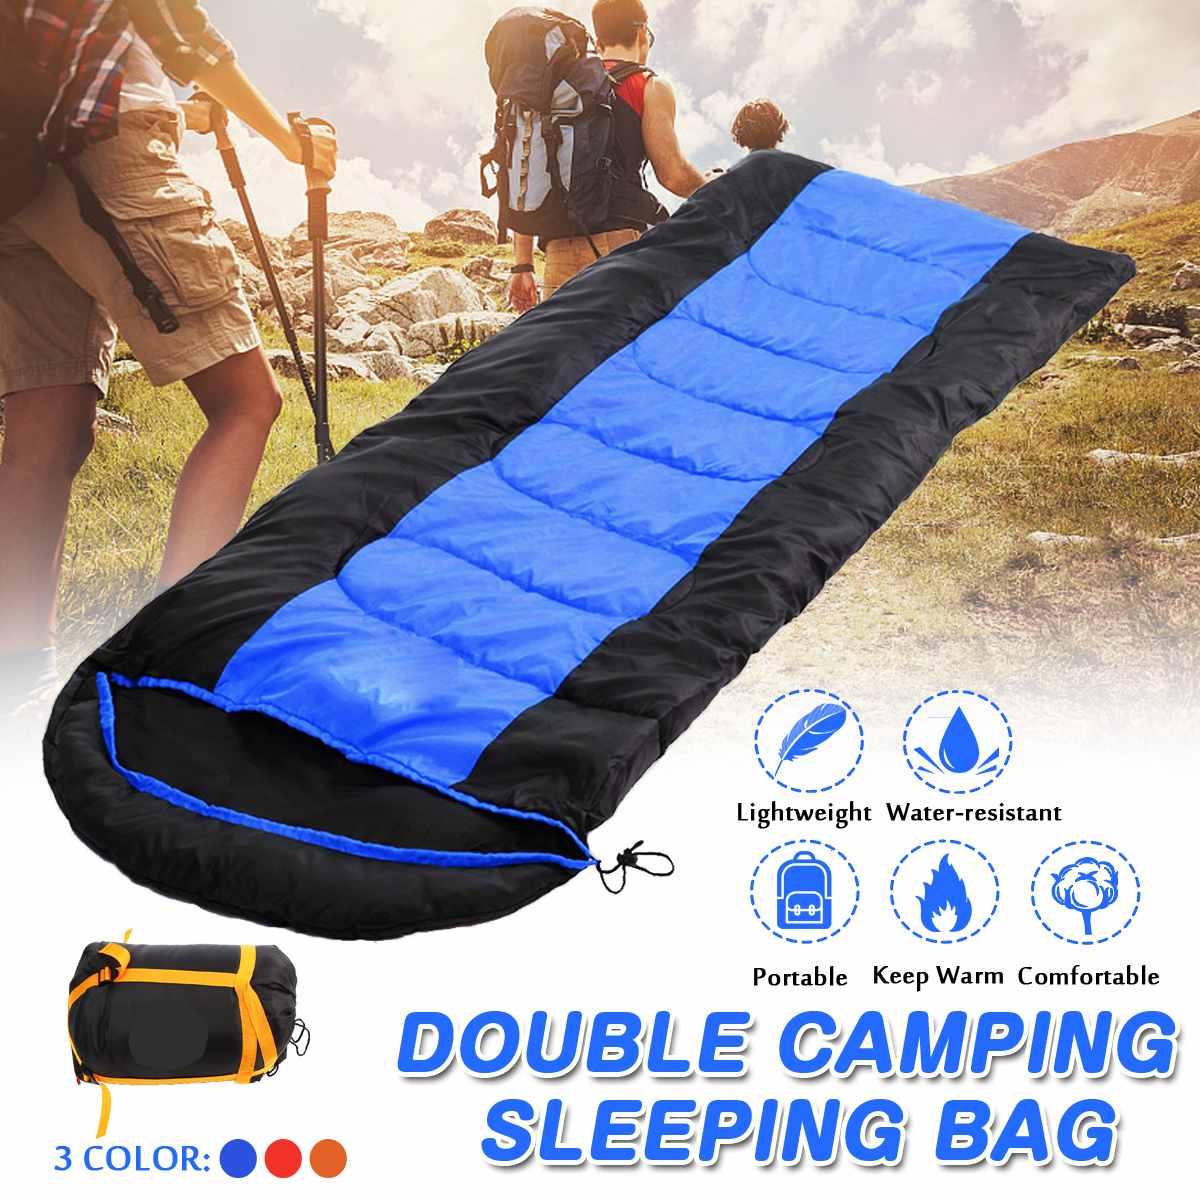 Thermal Single Outdoor Camping Sleeping Bag Compact Design O